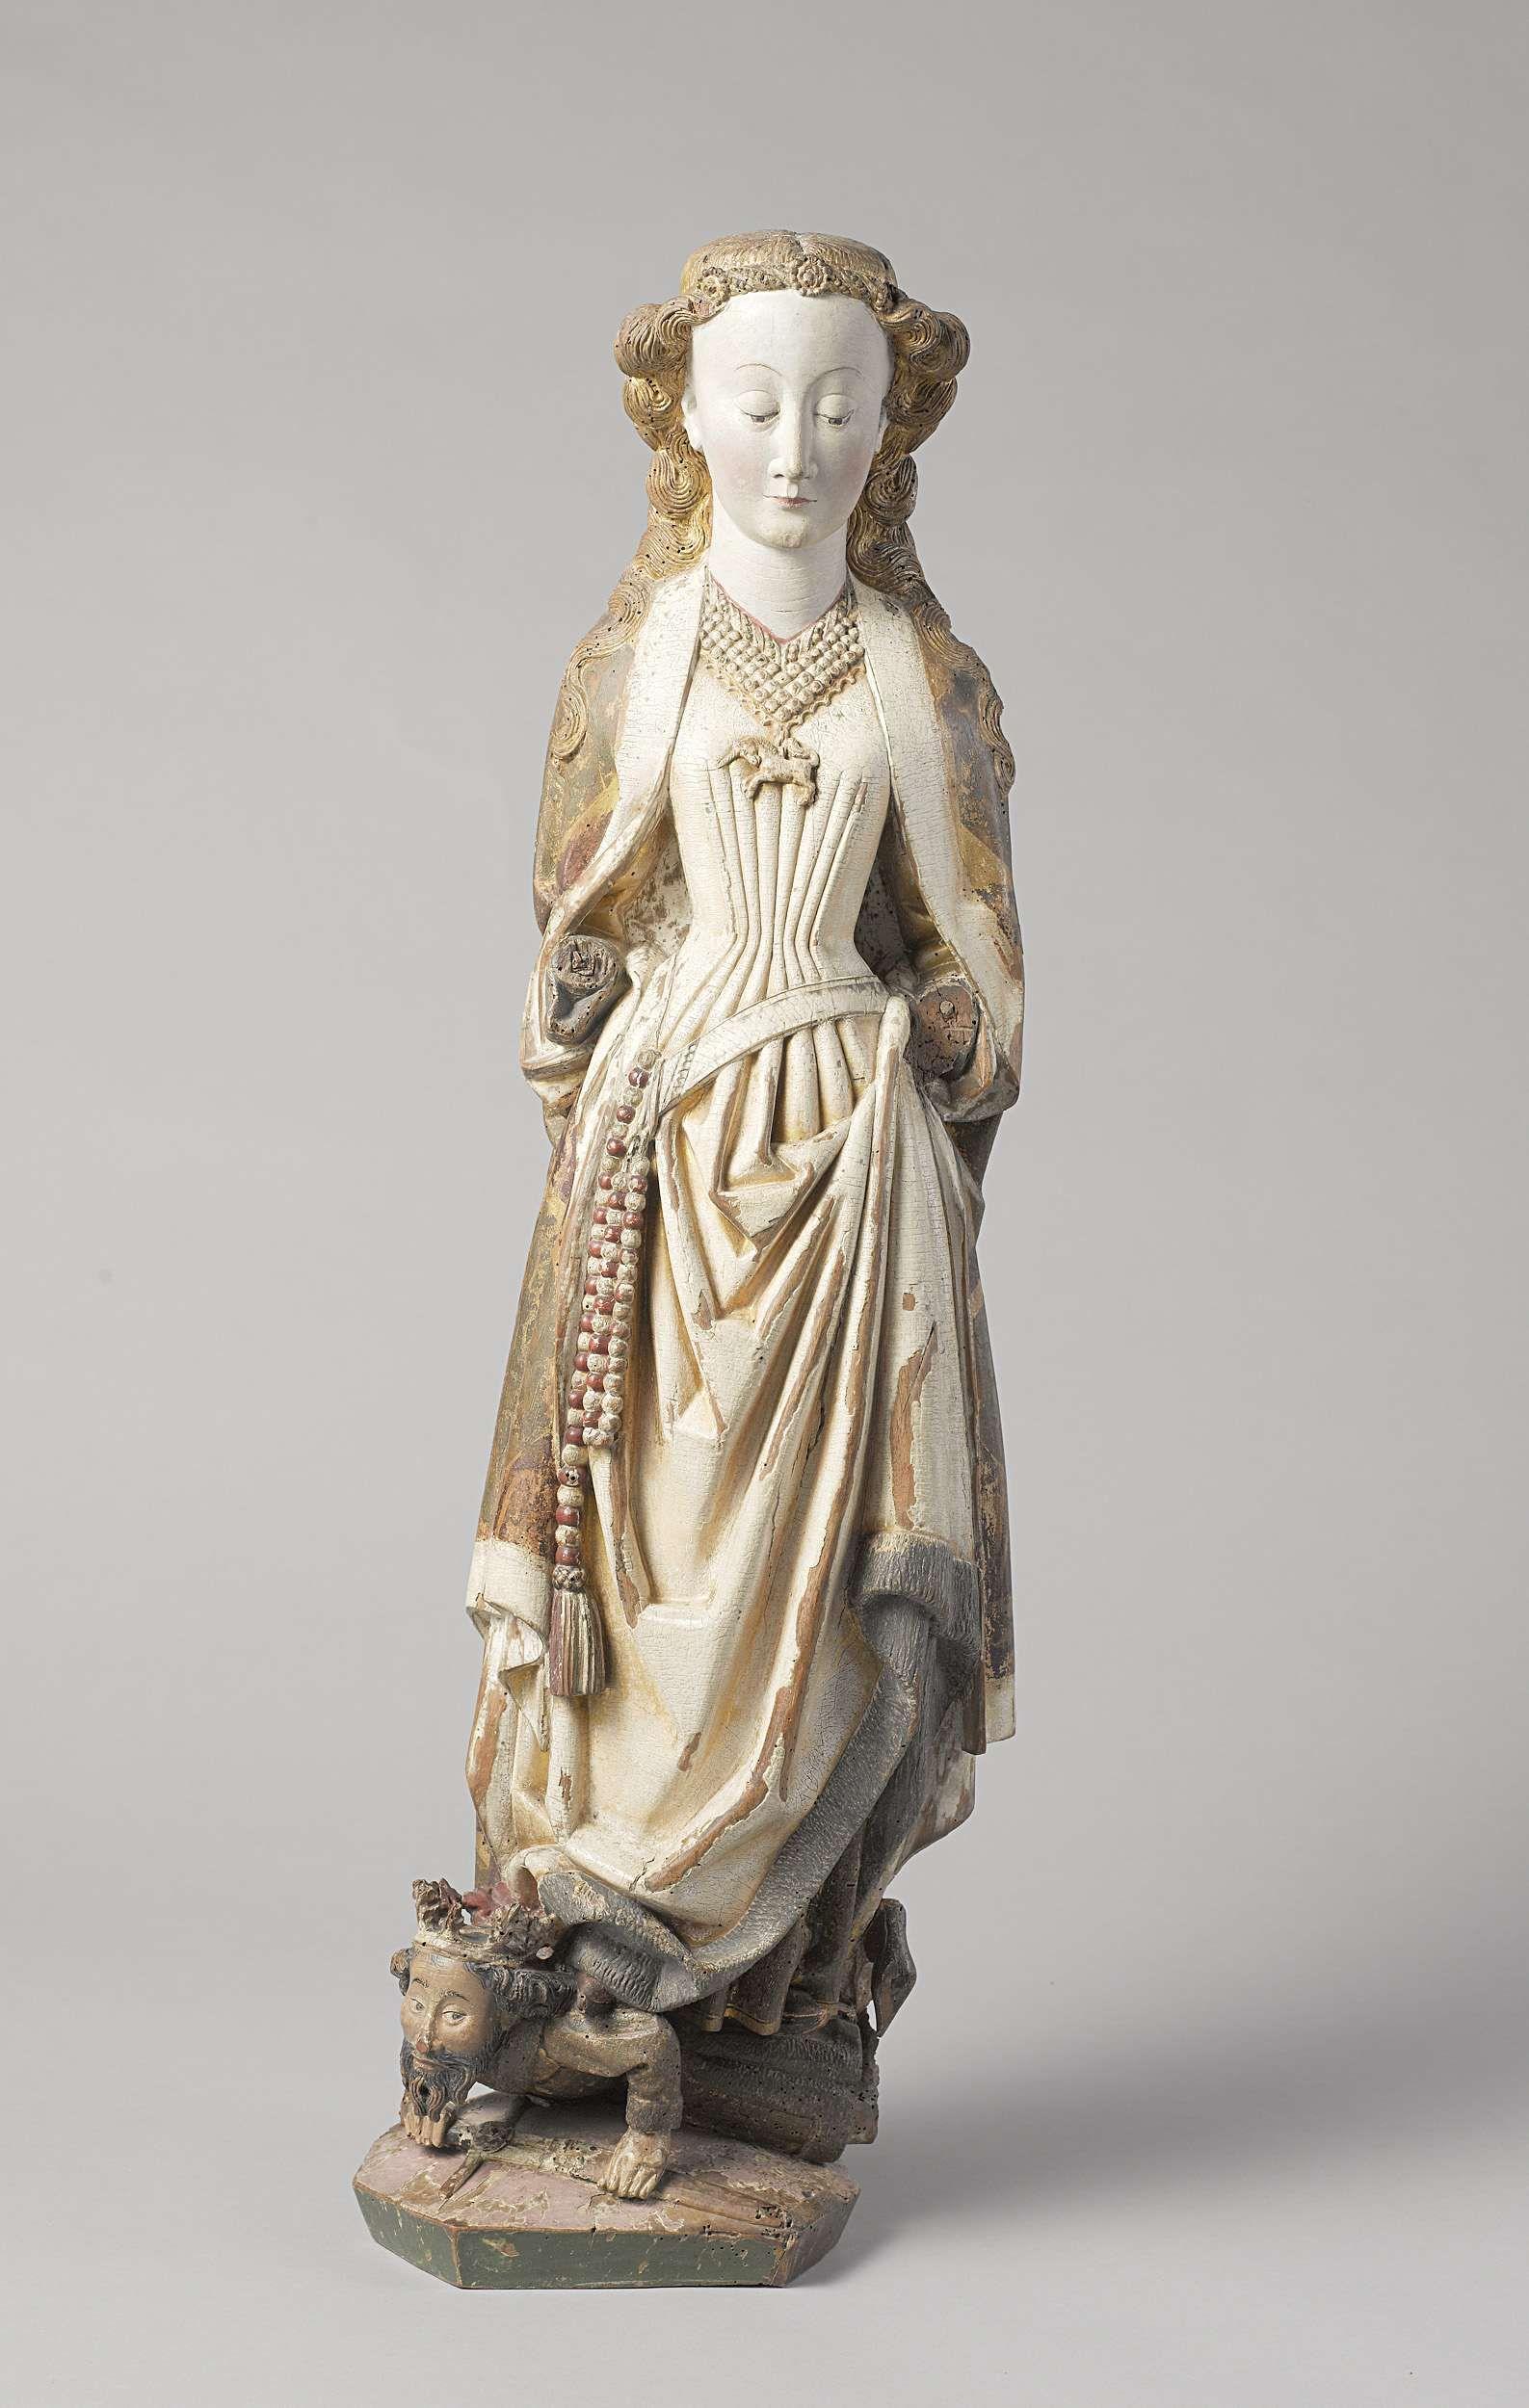 Sint-Barbara, Meester van Koudewater, ca. 1470